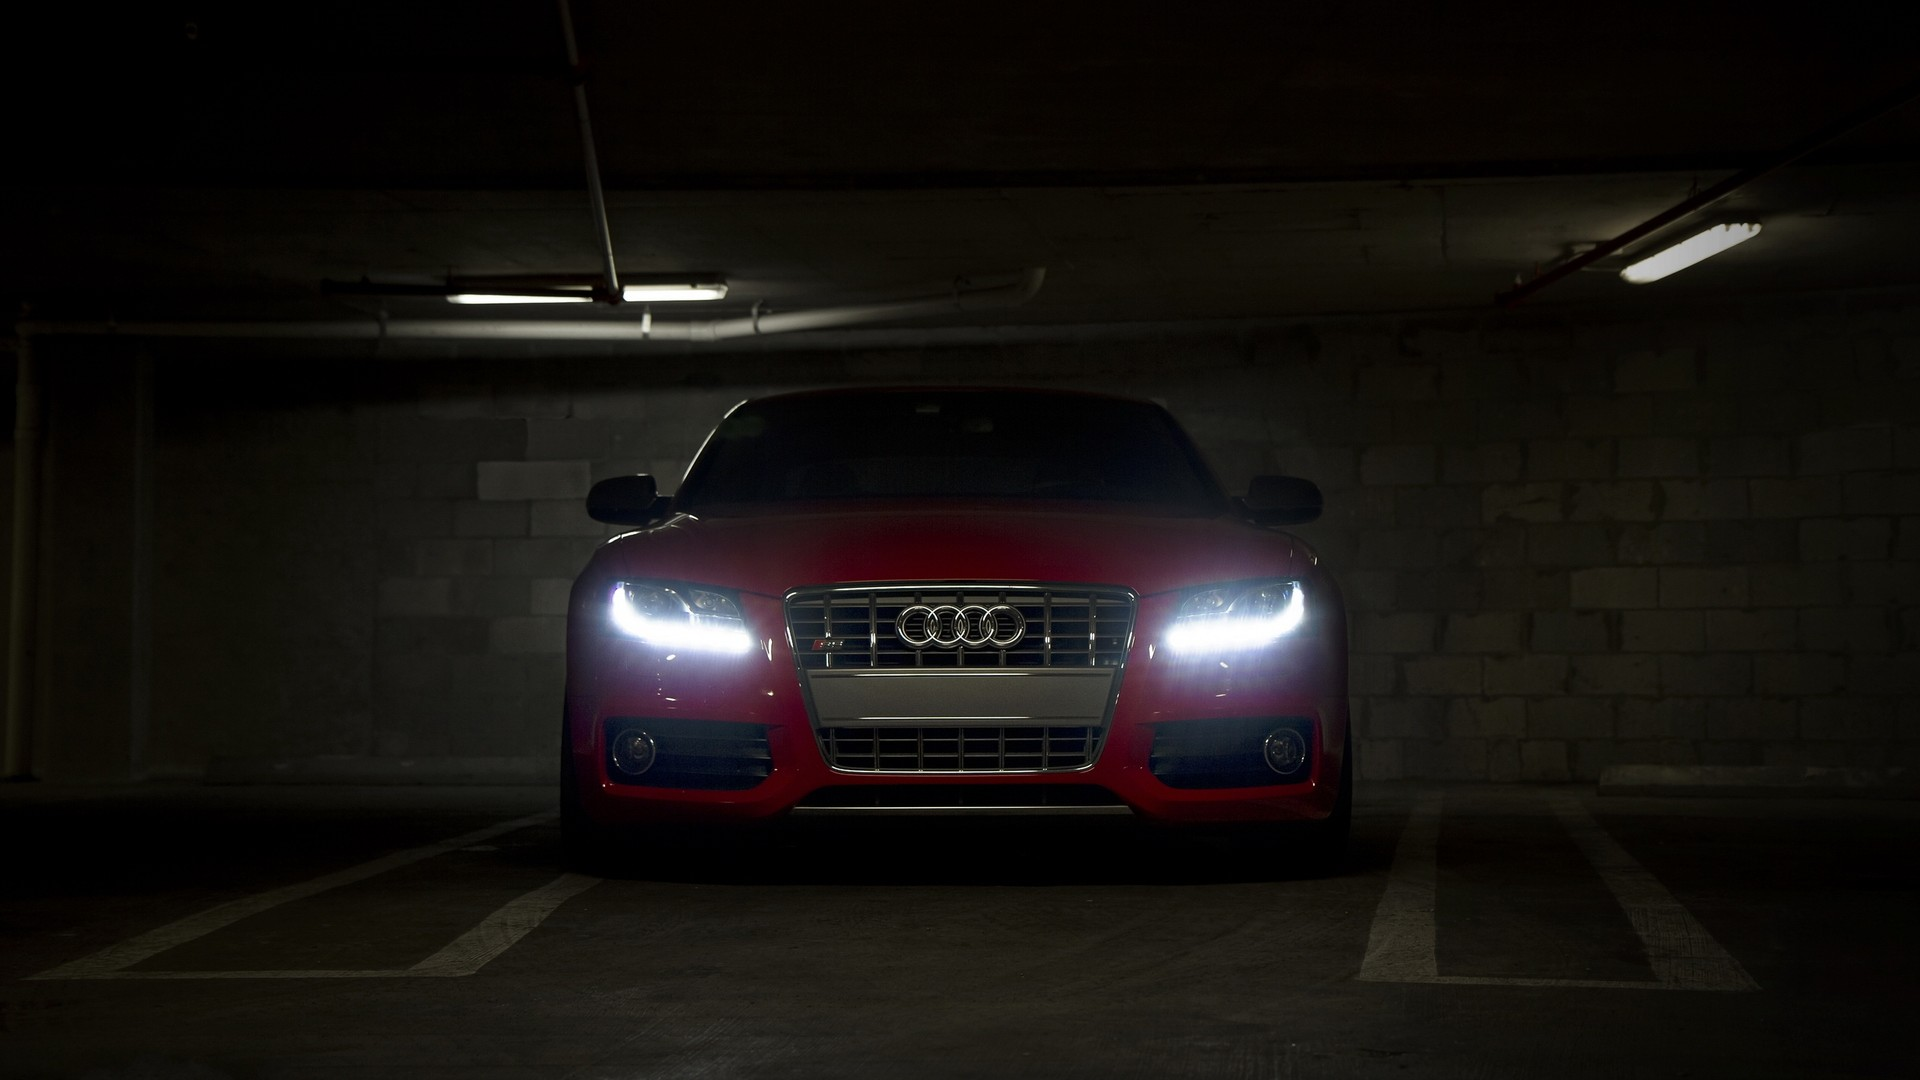 Audi Wallpaper Hd wallpaper   635890 1920x1080